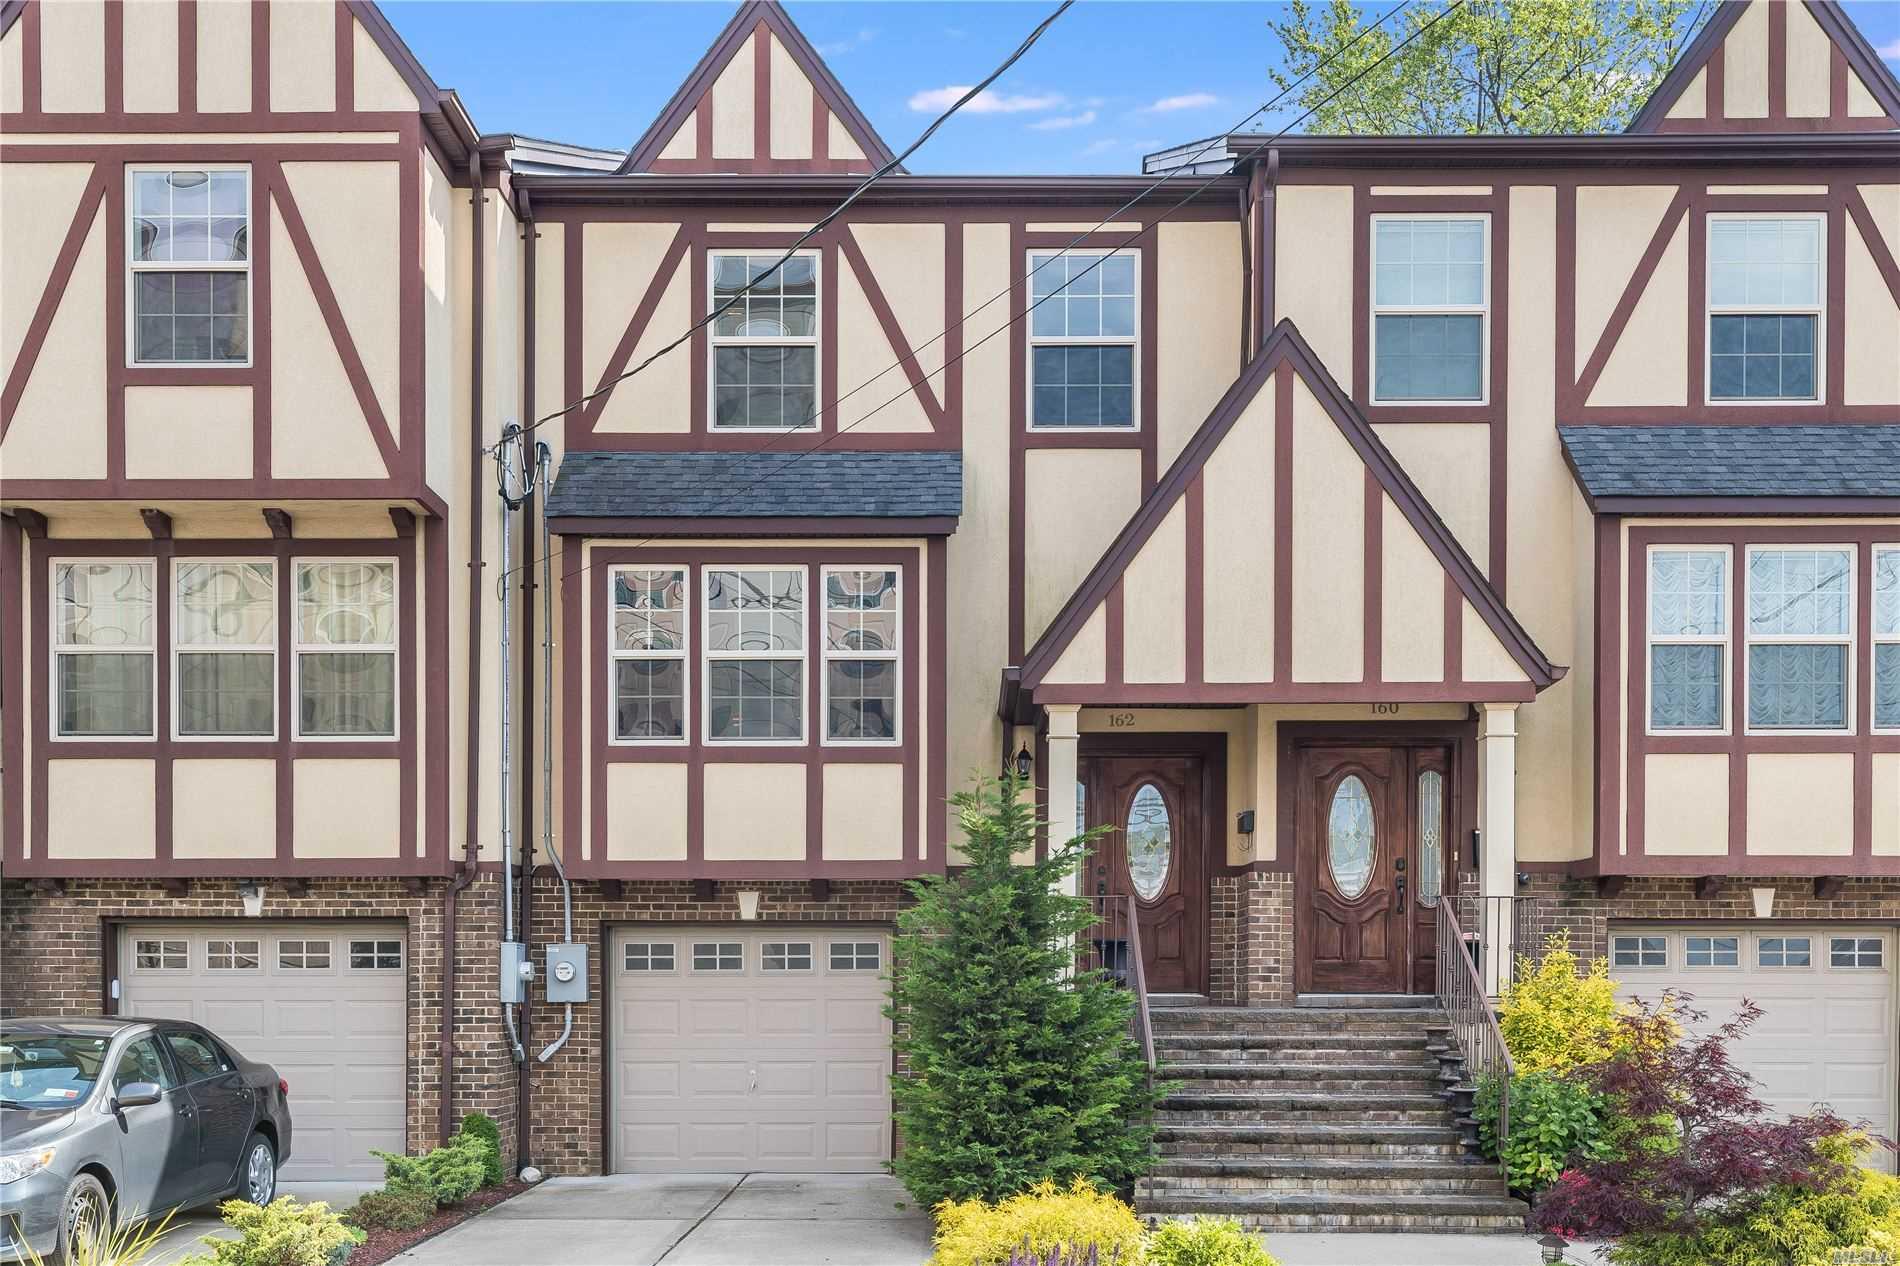 Property for sale at 162 Scranton Avenue, Lynbrook NY 11563, Lynbrook,  New York 11563